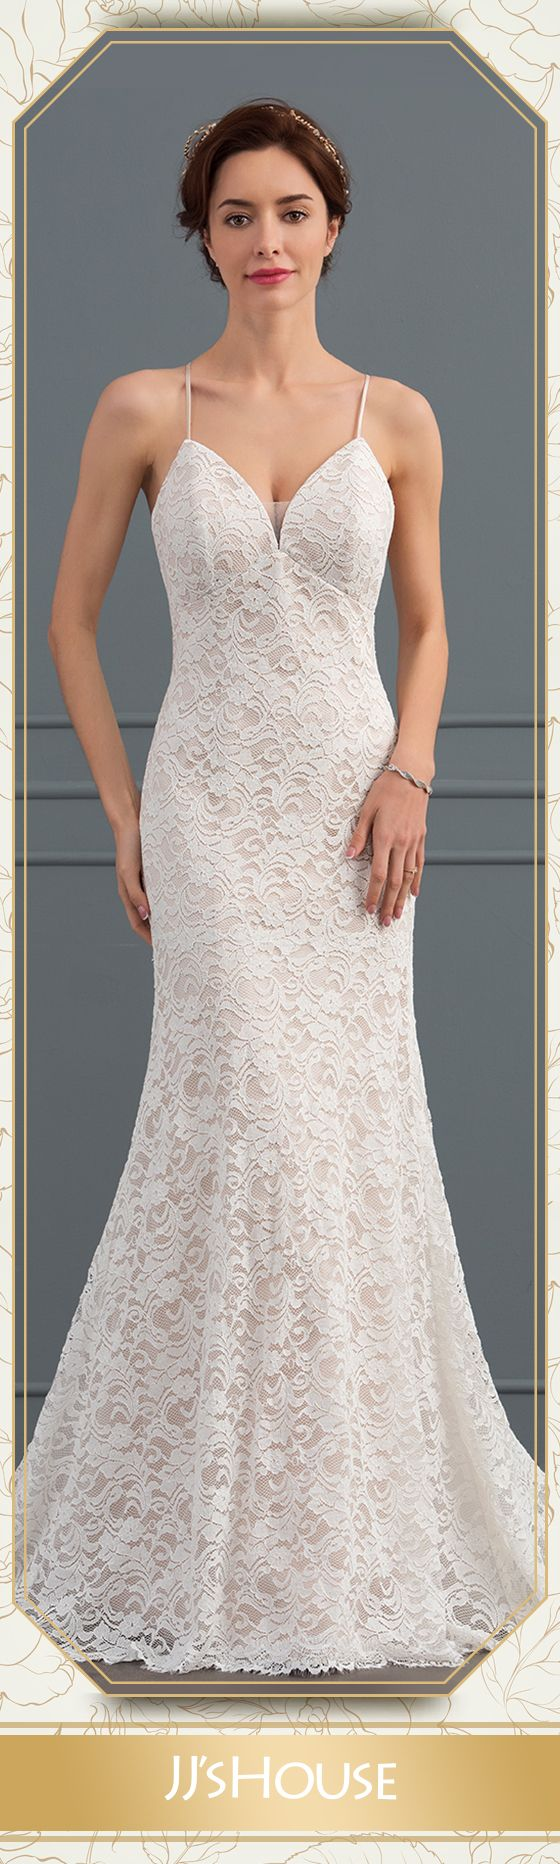 Us 206 00 Trumpet Mermaid Sweetheart Court Train Lace Wedding Dress Jj S House Wedding Dresses Lace Dresses Mermaid Sweetheart [ 1864 x 560 Pixel ]